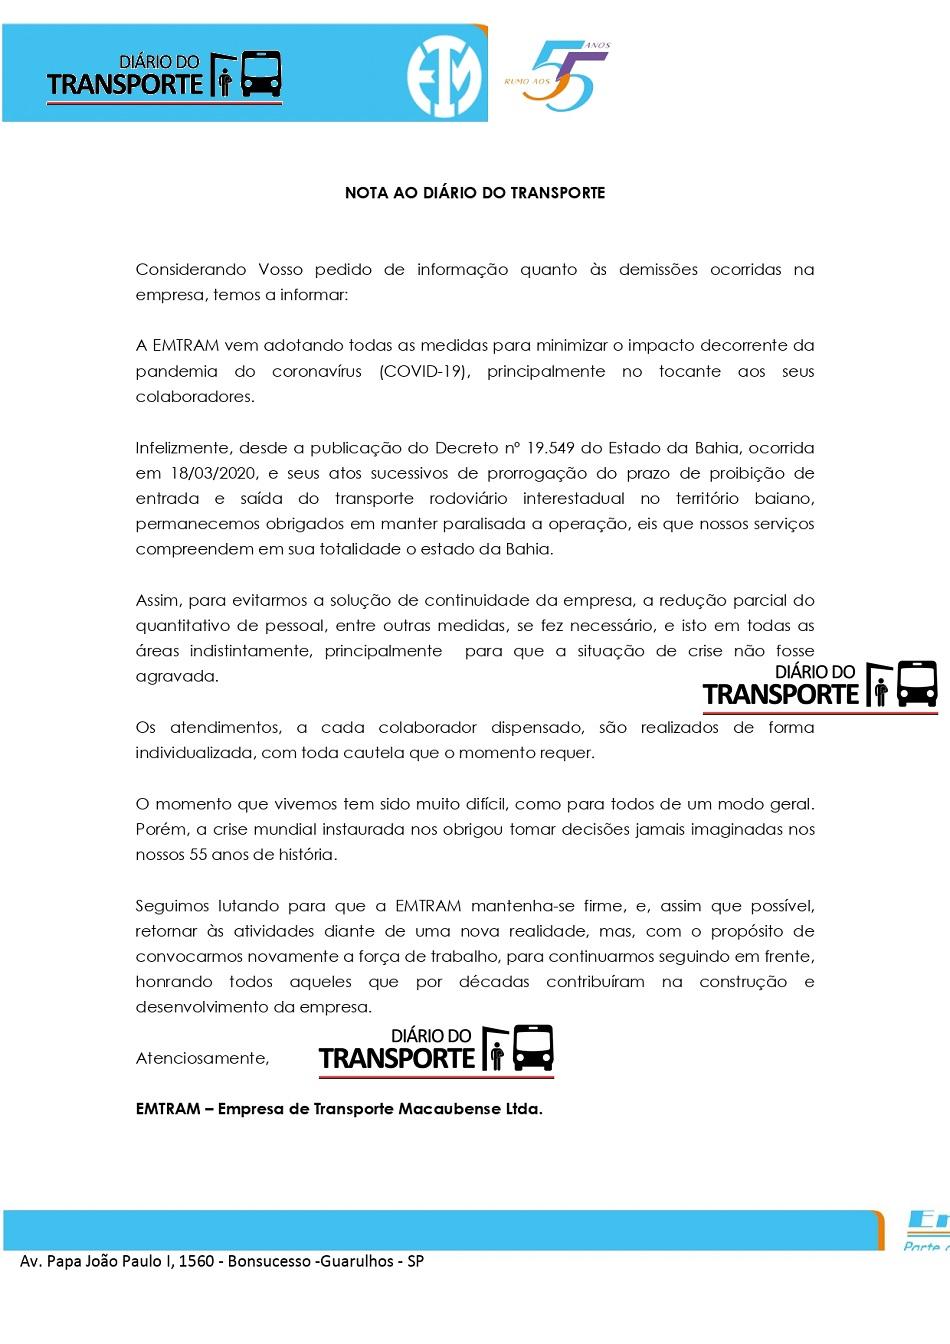 Nota ao Diario do Transporte_page-0001